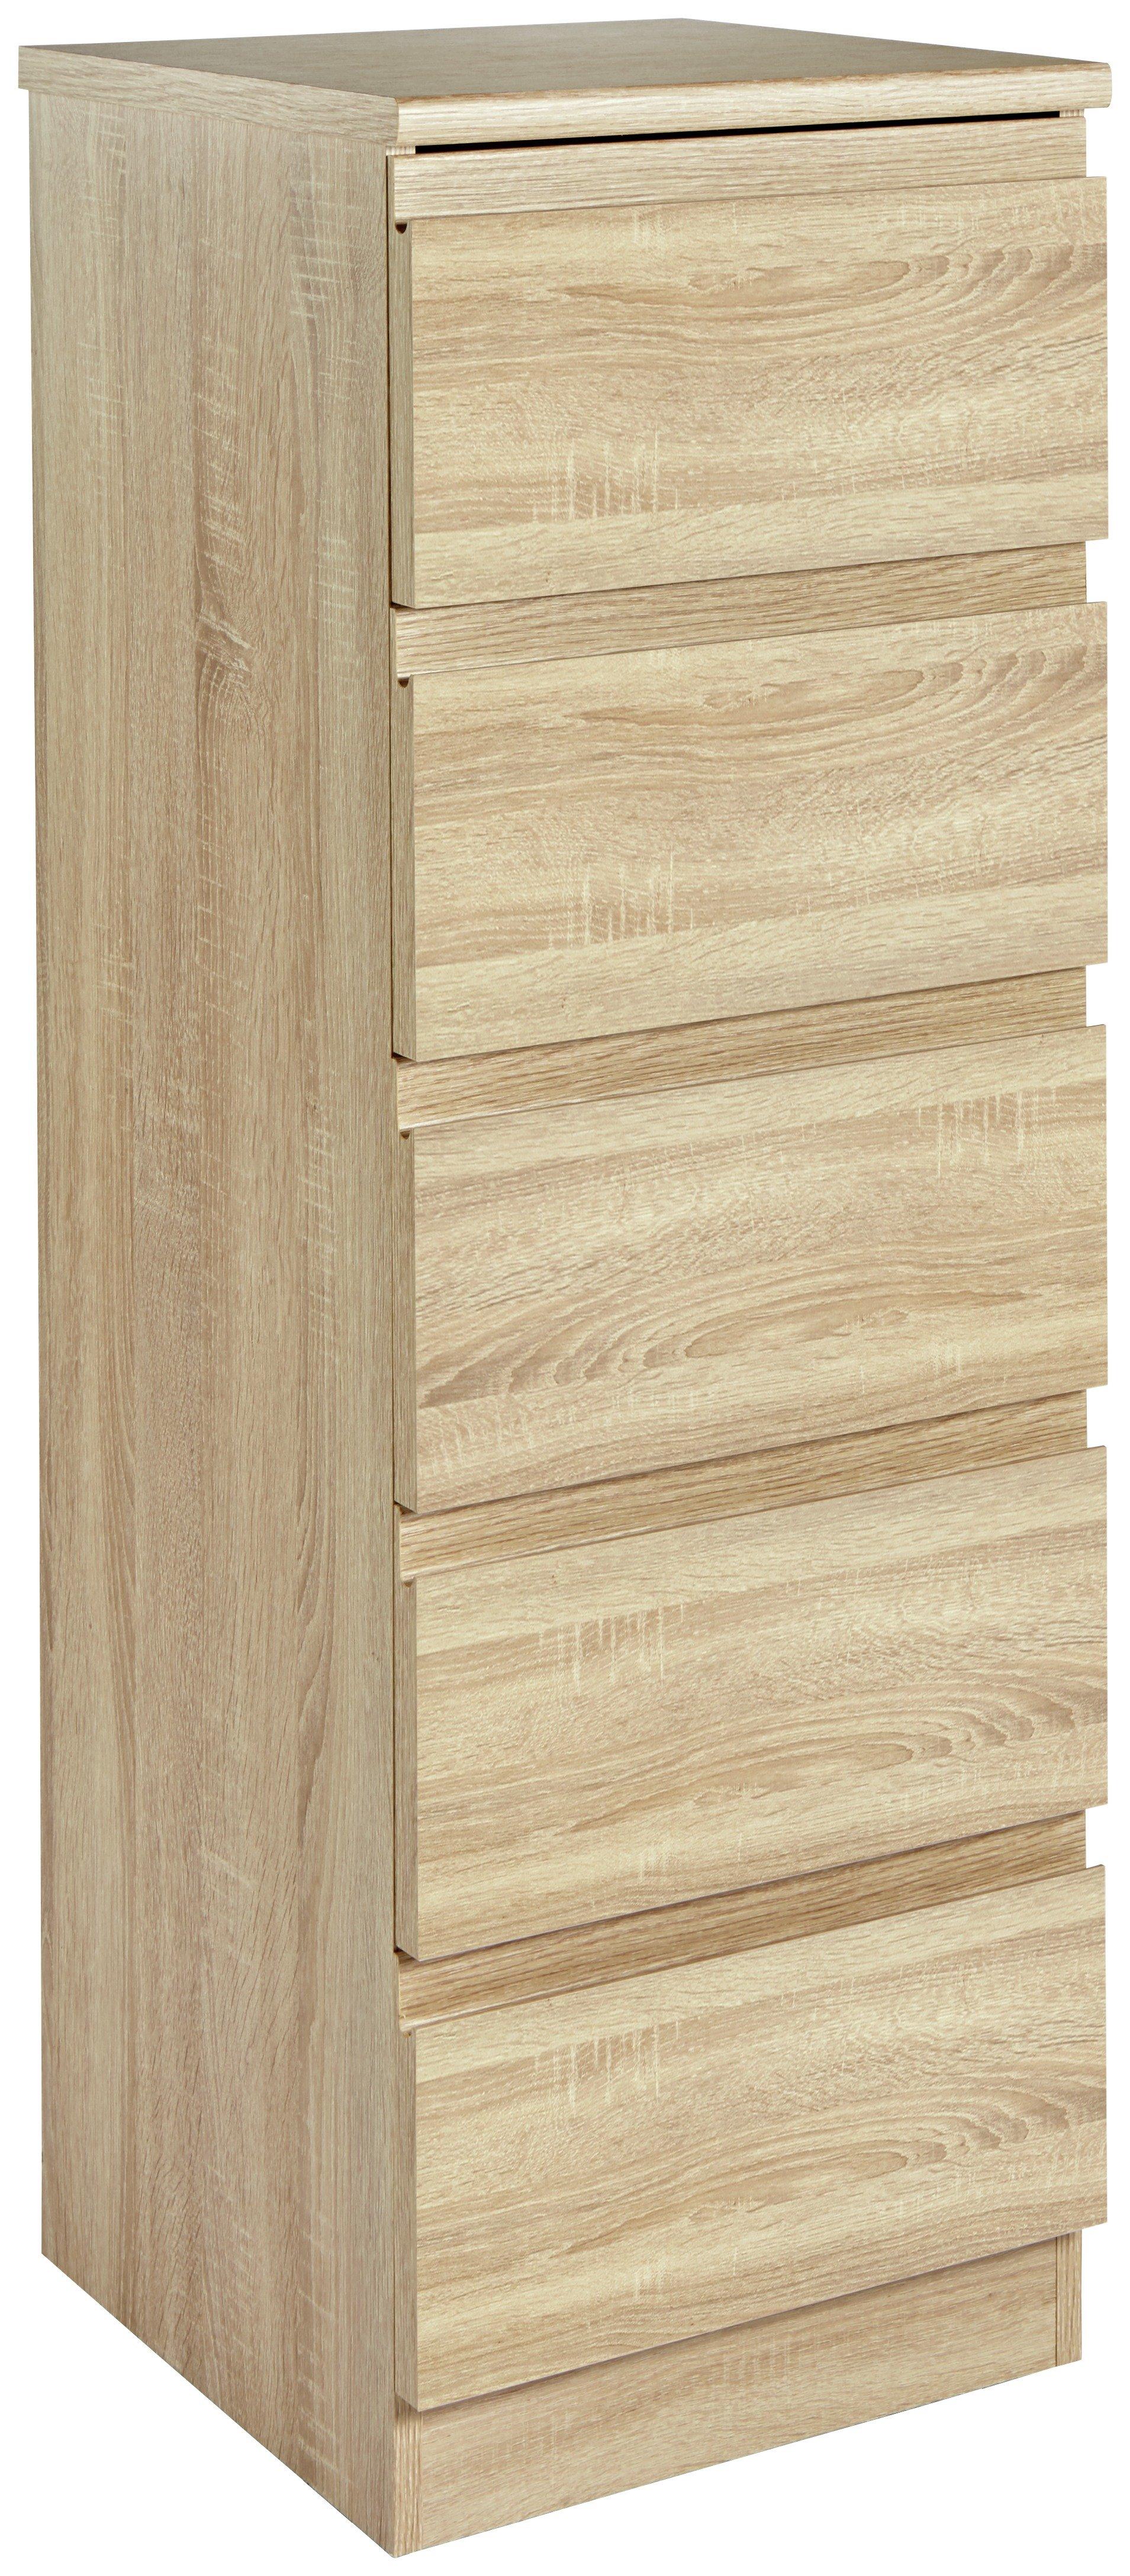 Image of Avenue 5 Drawer Tallboy Chest - Natural Oak Effect